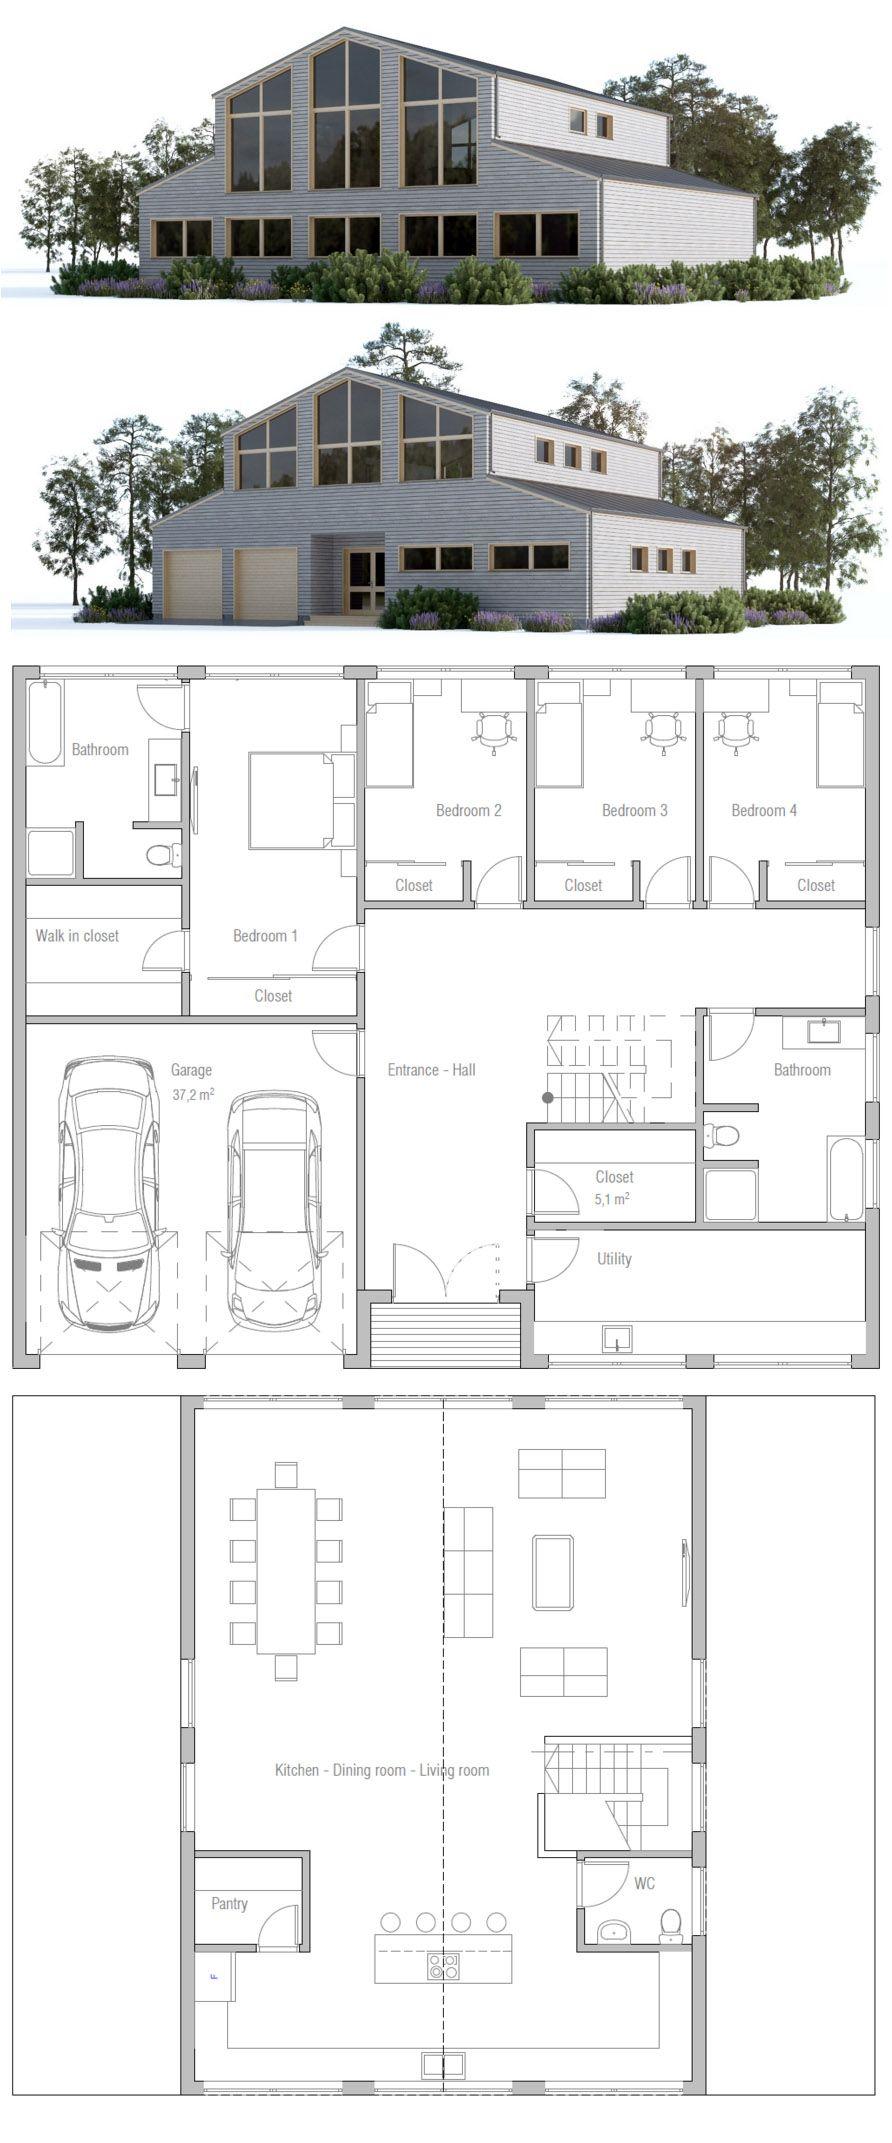 Architecture Home Decor Architecture Moderndesign Modernarchitecture New House Plans Dream House Plans Architecture